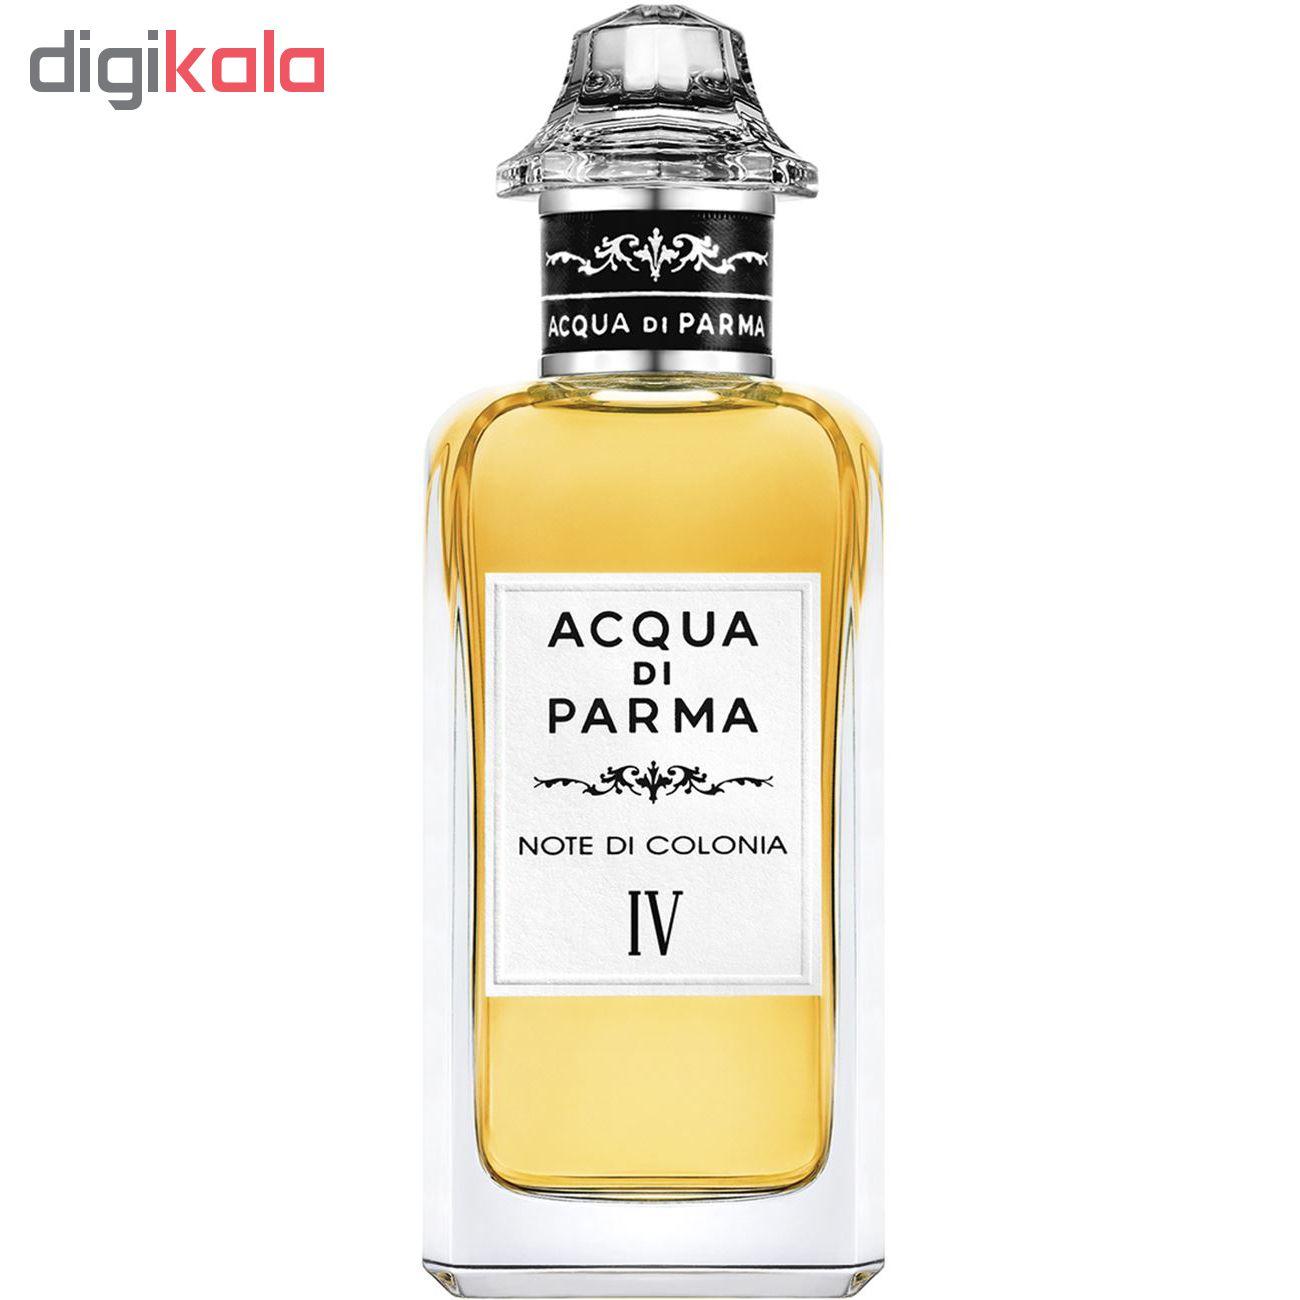 ادو کلن آکوا دی پارما مدل NOTE DI COLONIA IV حجم 150 میلی لیتر